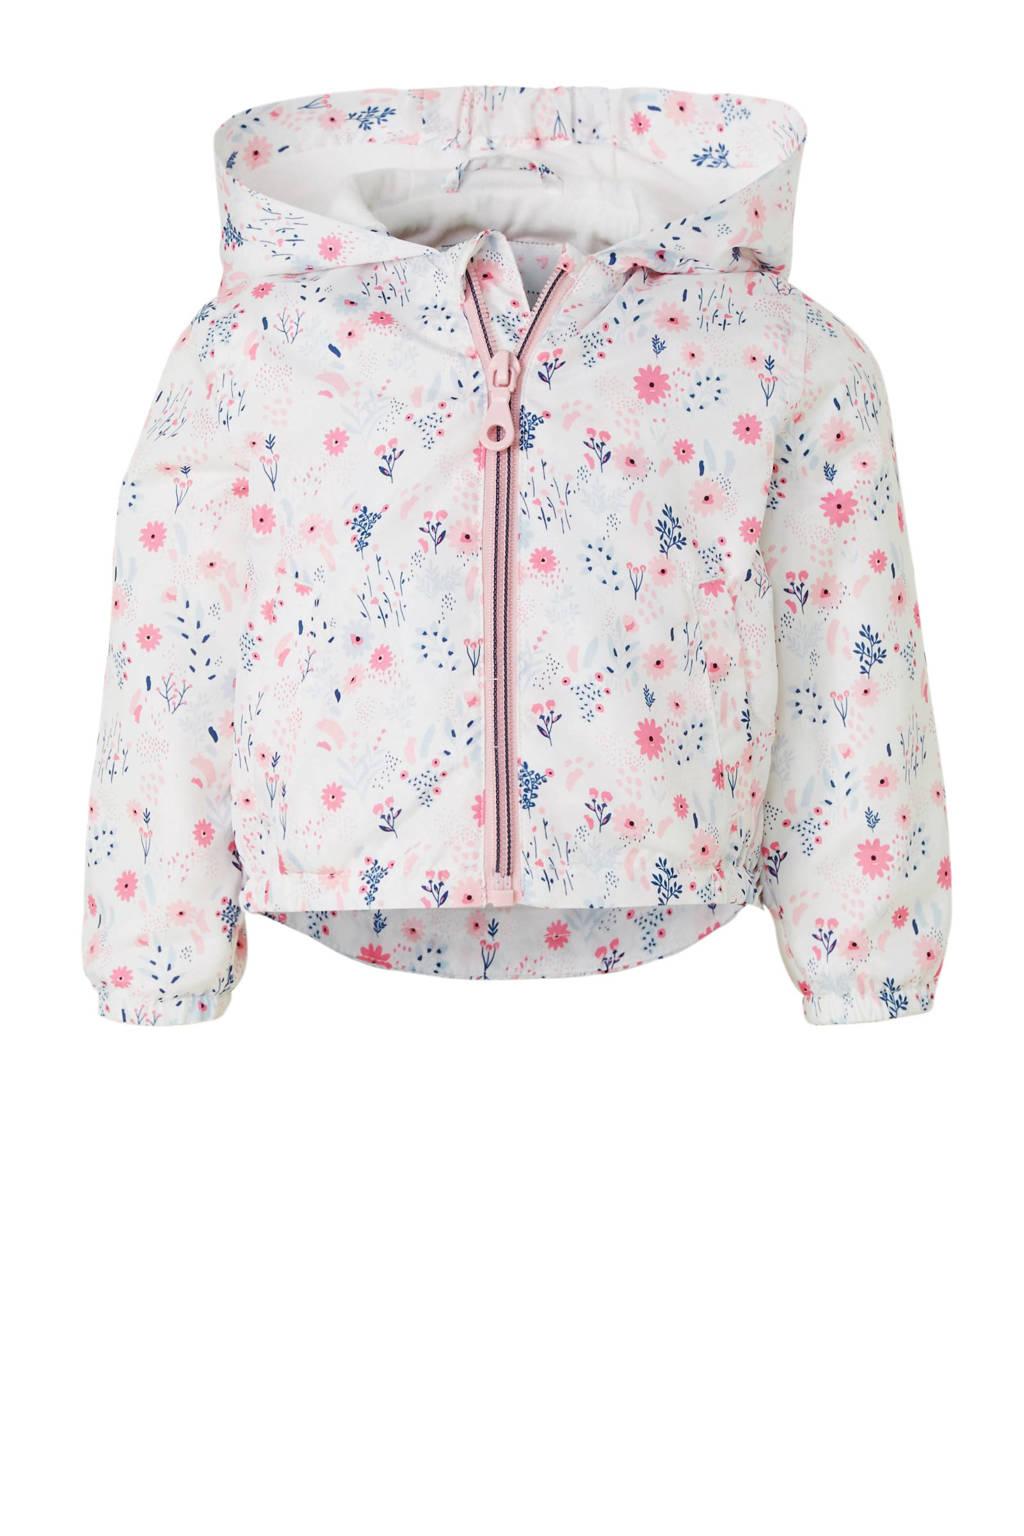 C&A Baby Club gebloemde zomerjas wit, Wit/roze